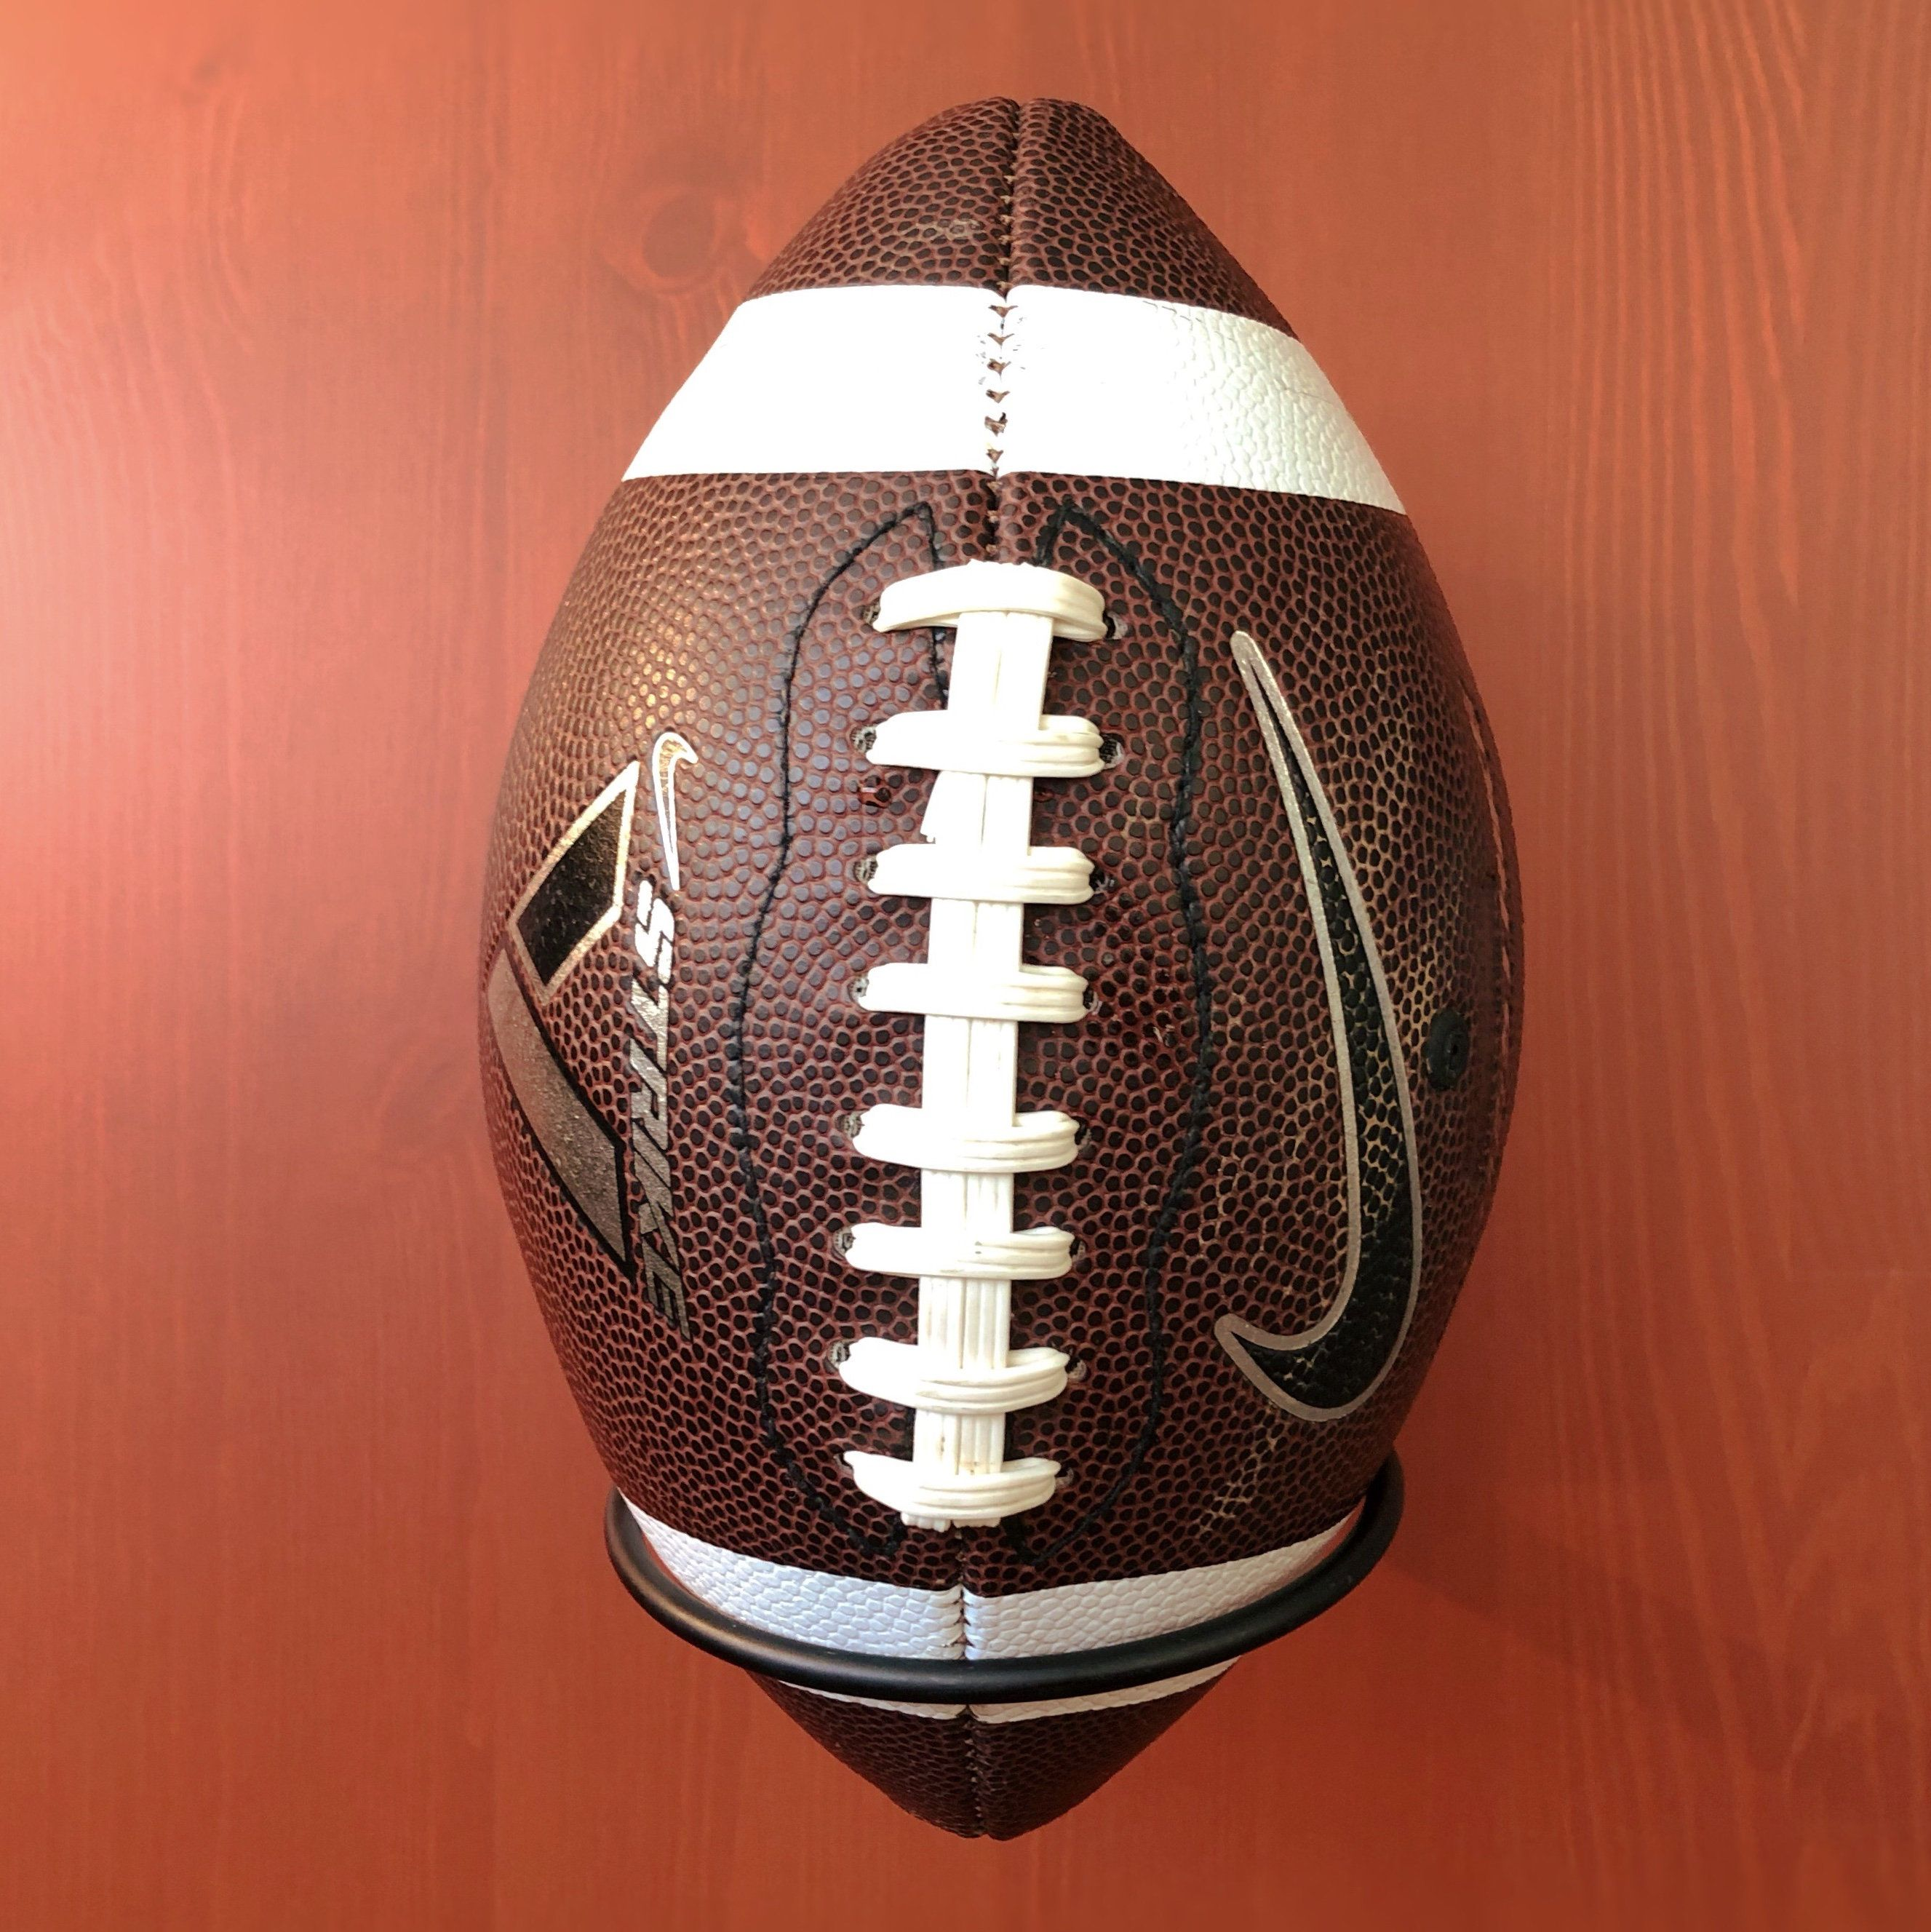 Football wall mounted holder for garages basement kids